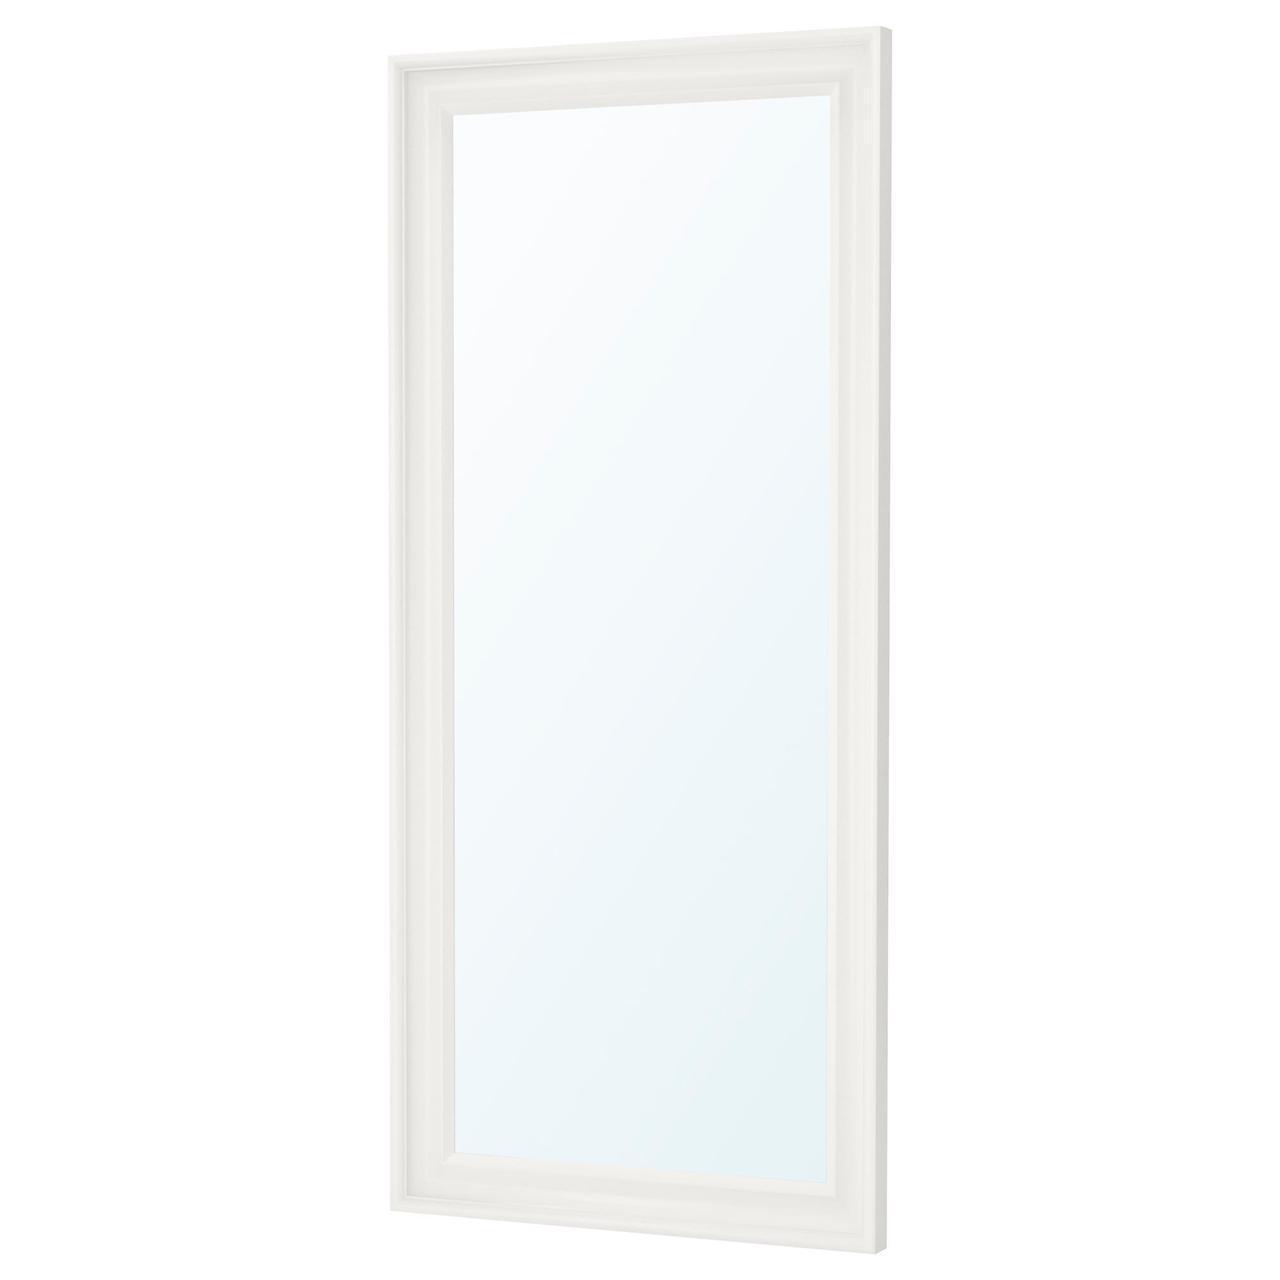 Зеркало IKEA HEMNES 74x165 см настенное белое 003.924.99